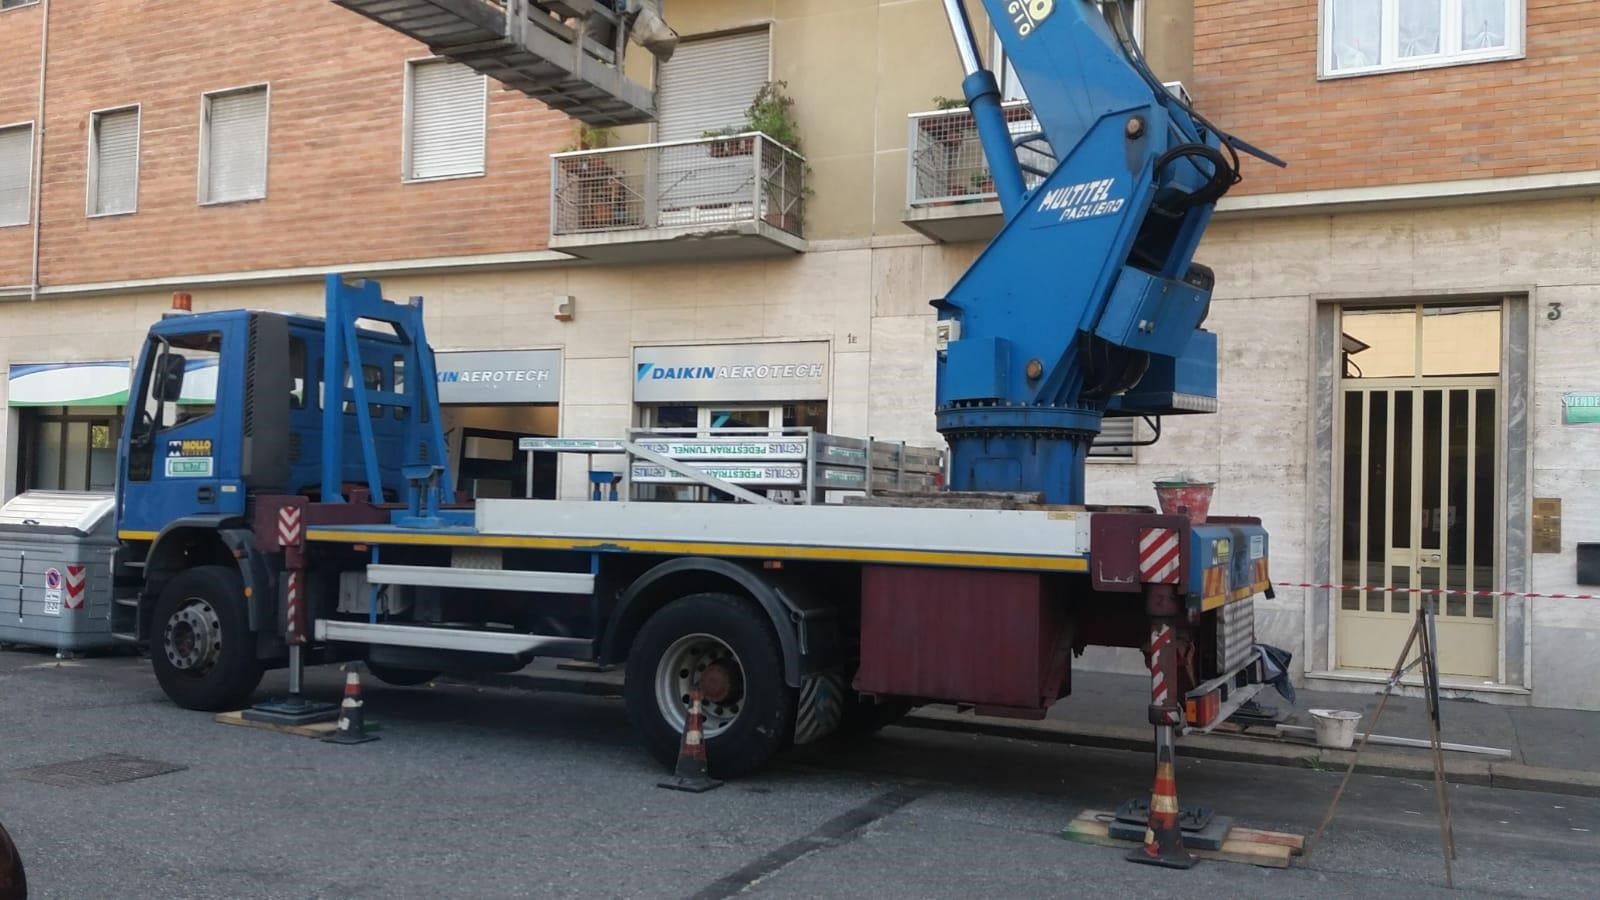 PAGLIERO J335 ALU/EX -0496